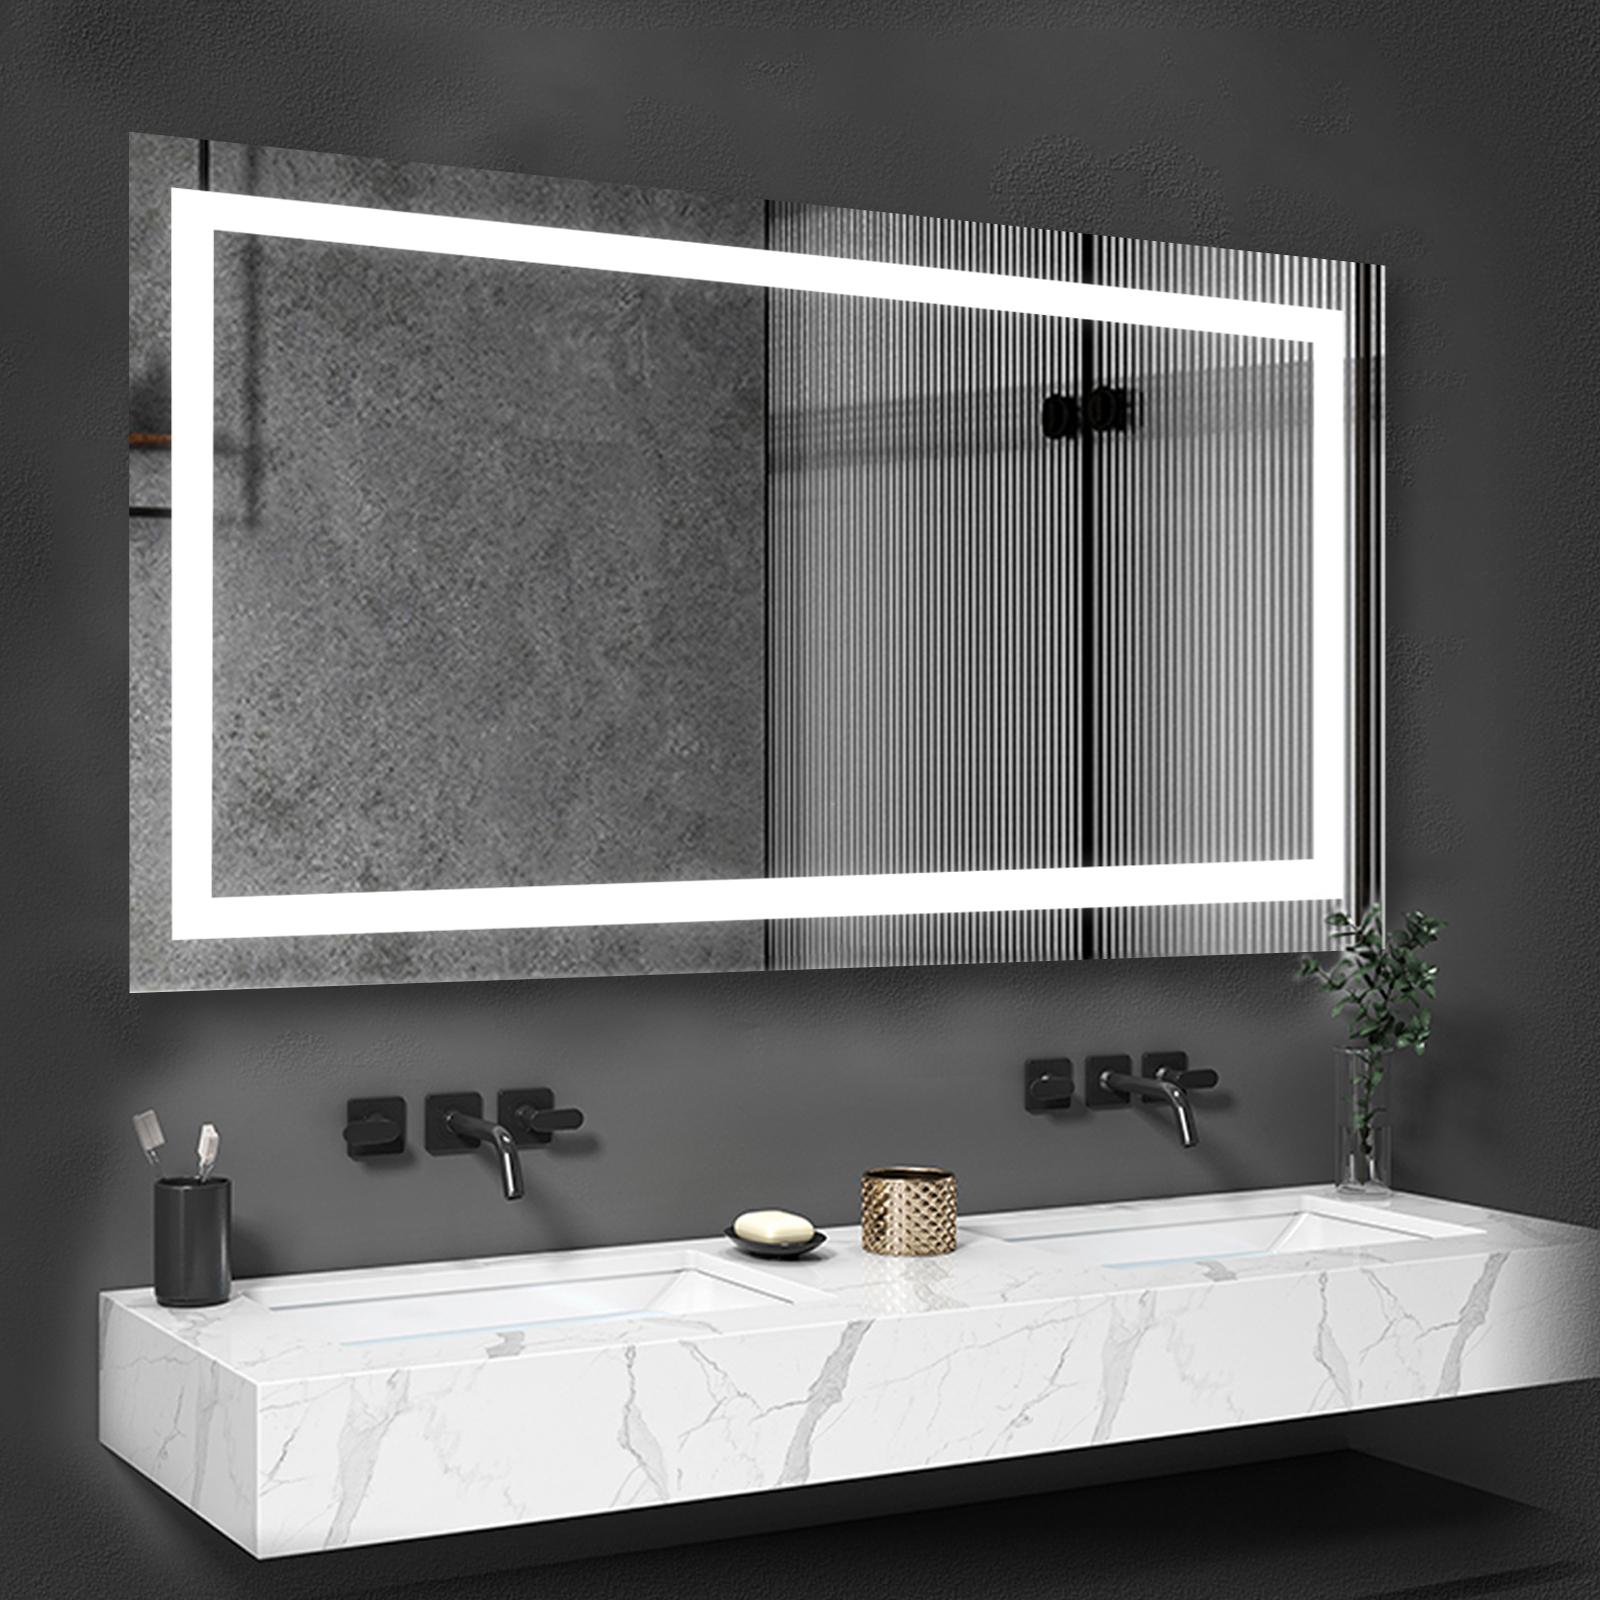 LED Vanity Bathroom Wall Mirror Factory